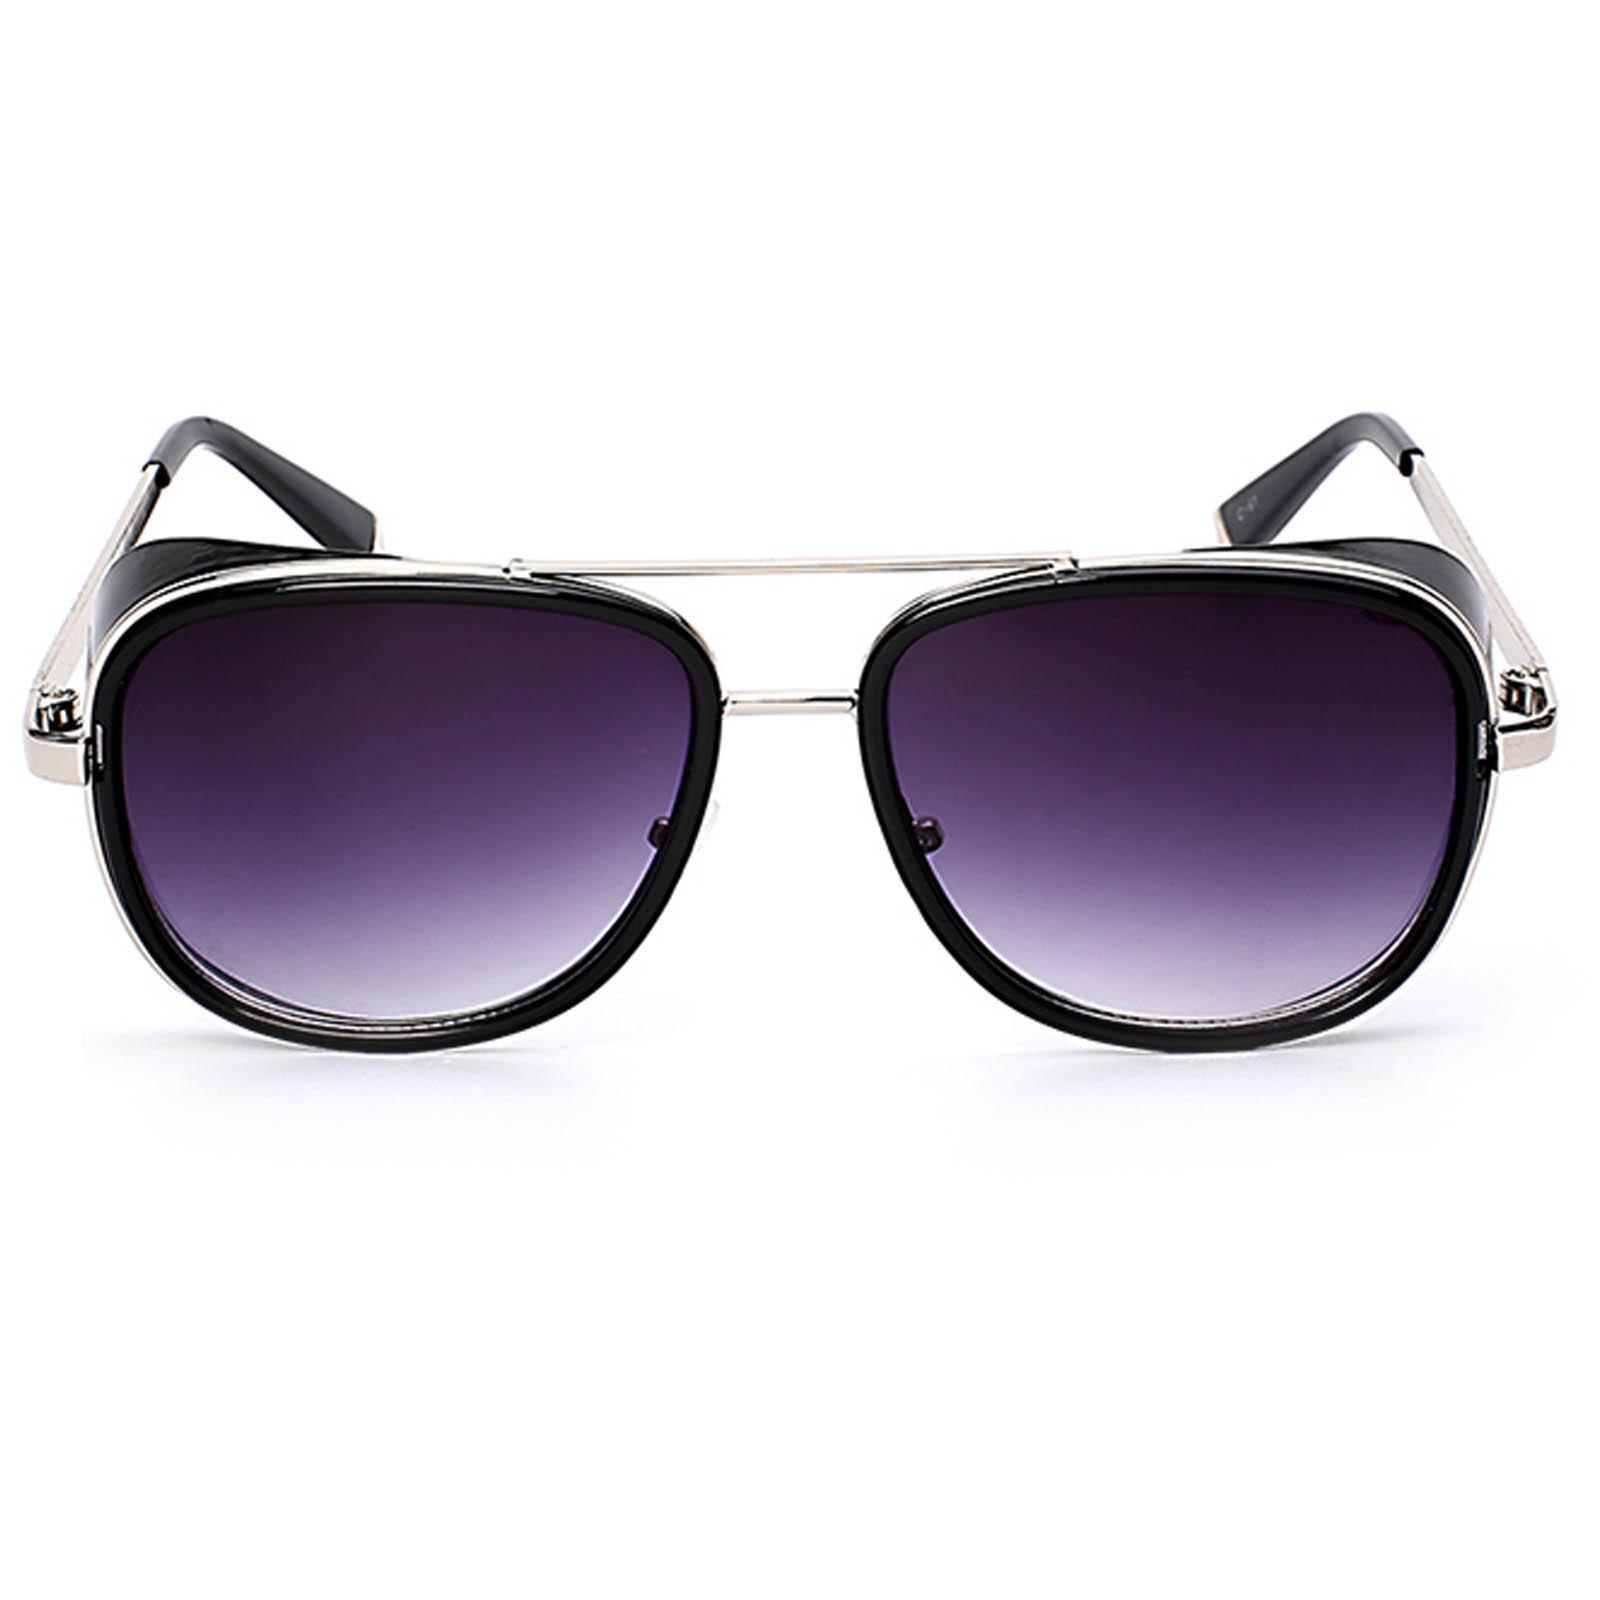 6735f067cd ... OWL ® 002 C3 Aviator Eyewear Sunglasses Women s Men s Metal Black Frame  Smoke Lens One Pair ...